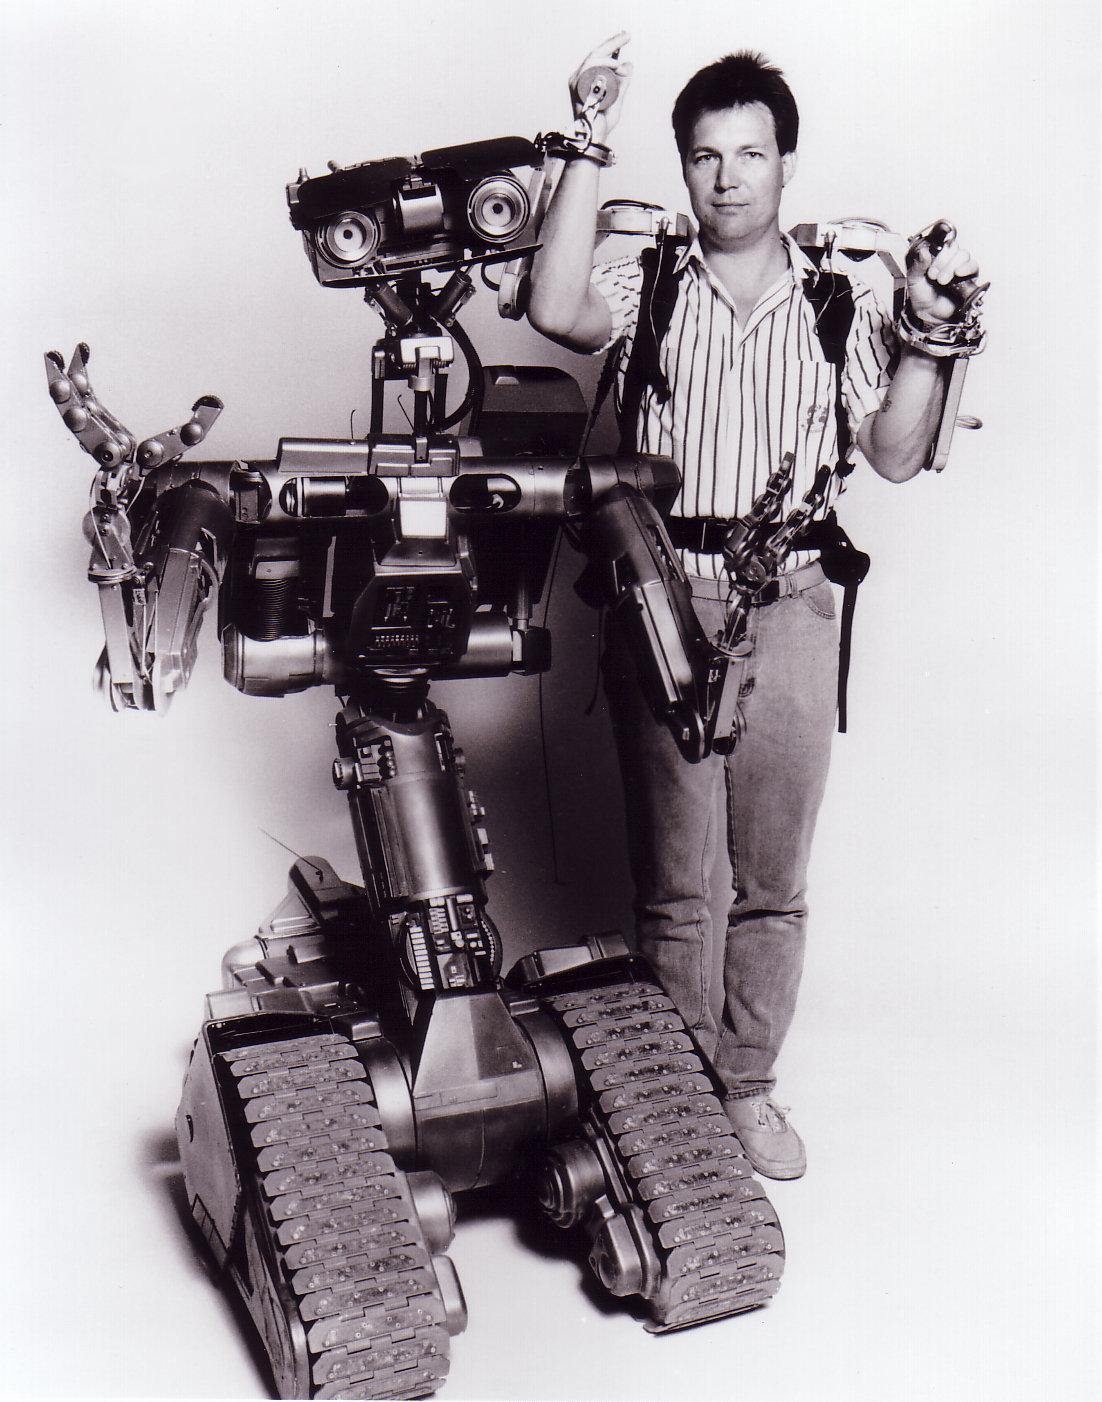 Eric Allard and Johnny Five, 1987